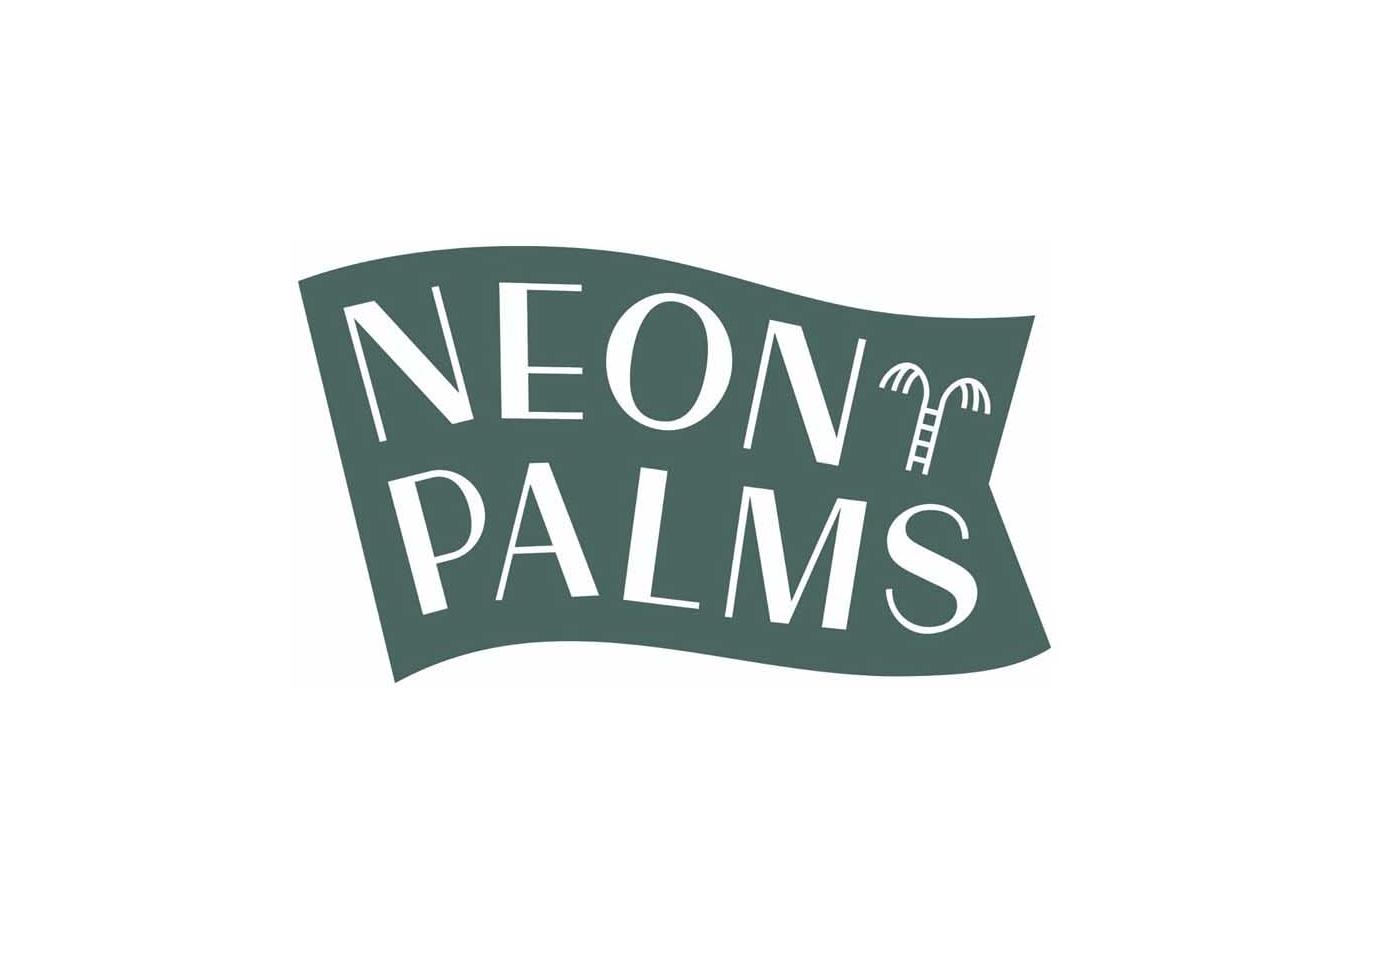 NeonPalms_small.jpg